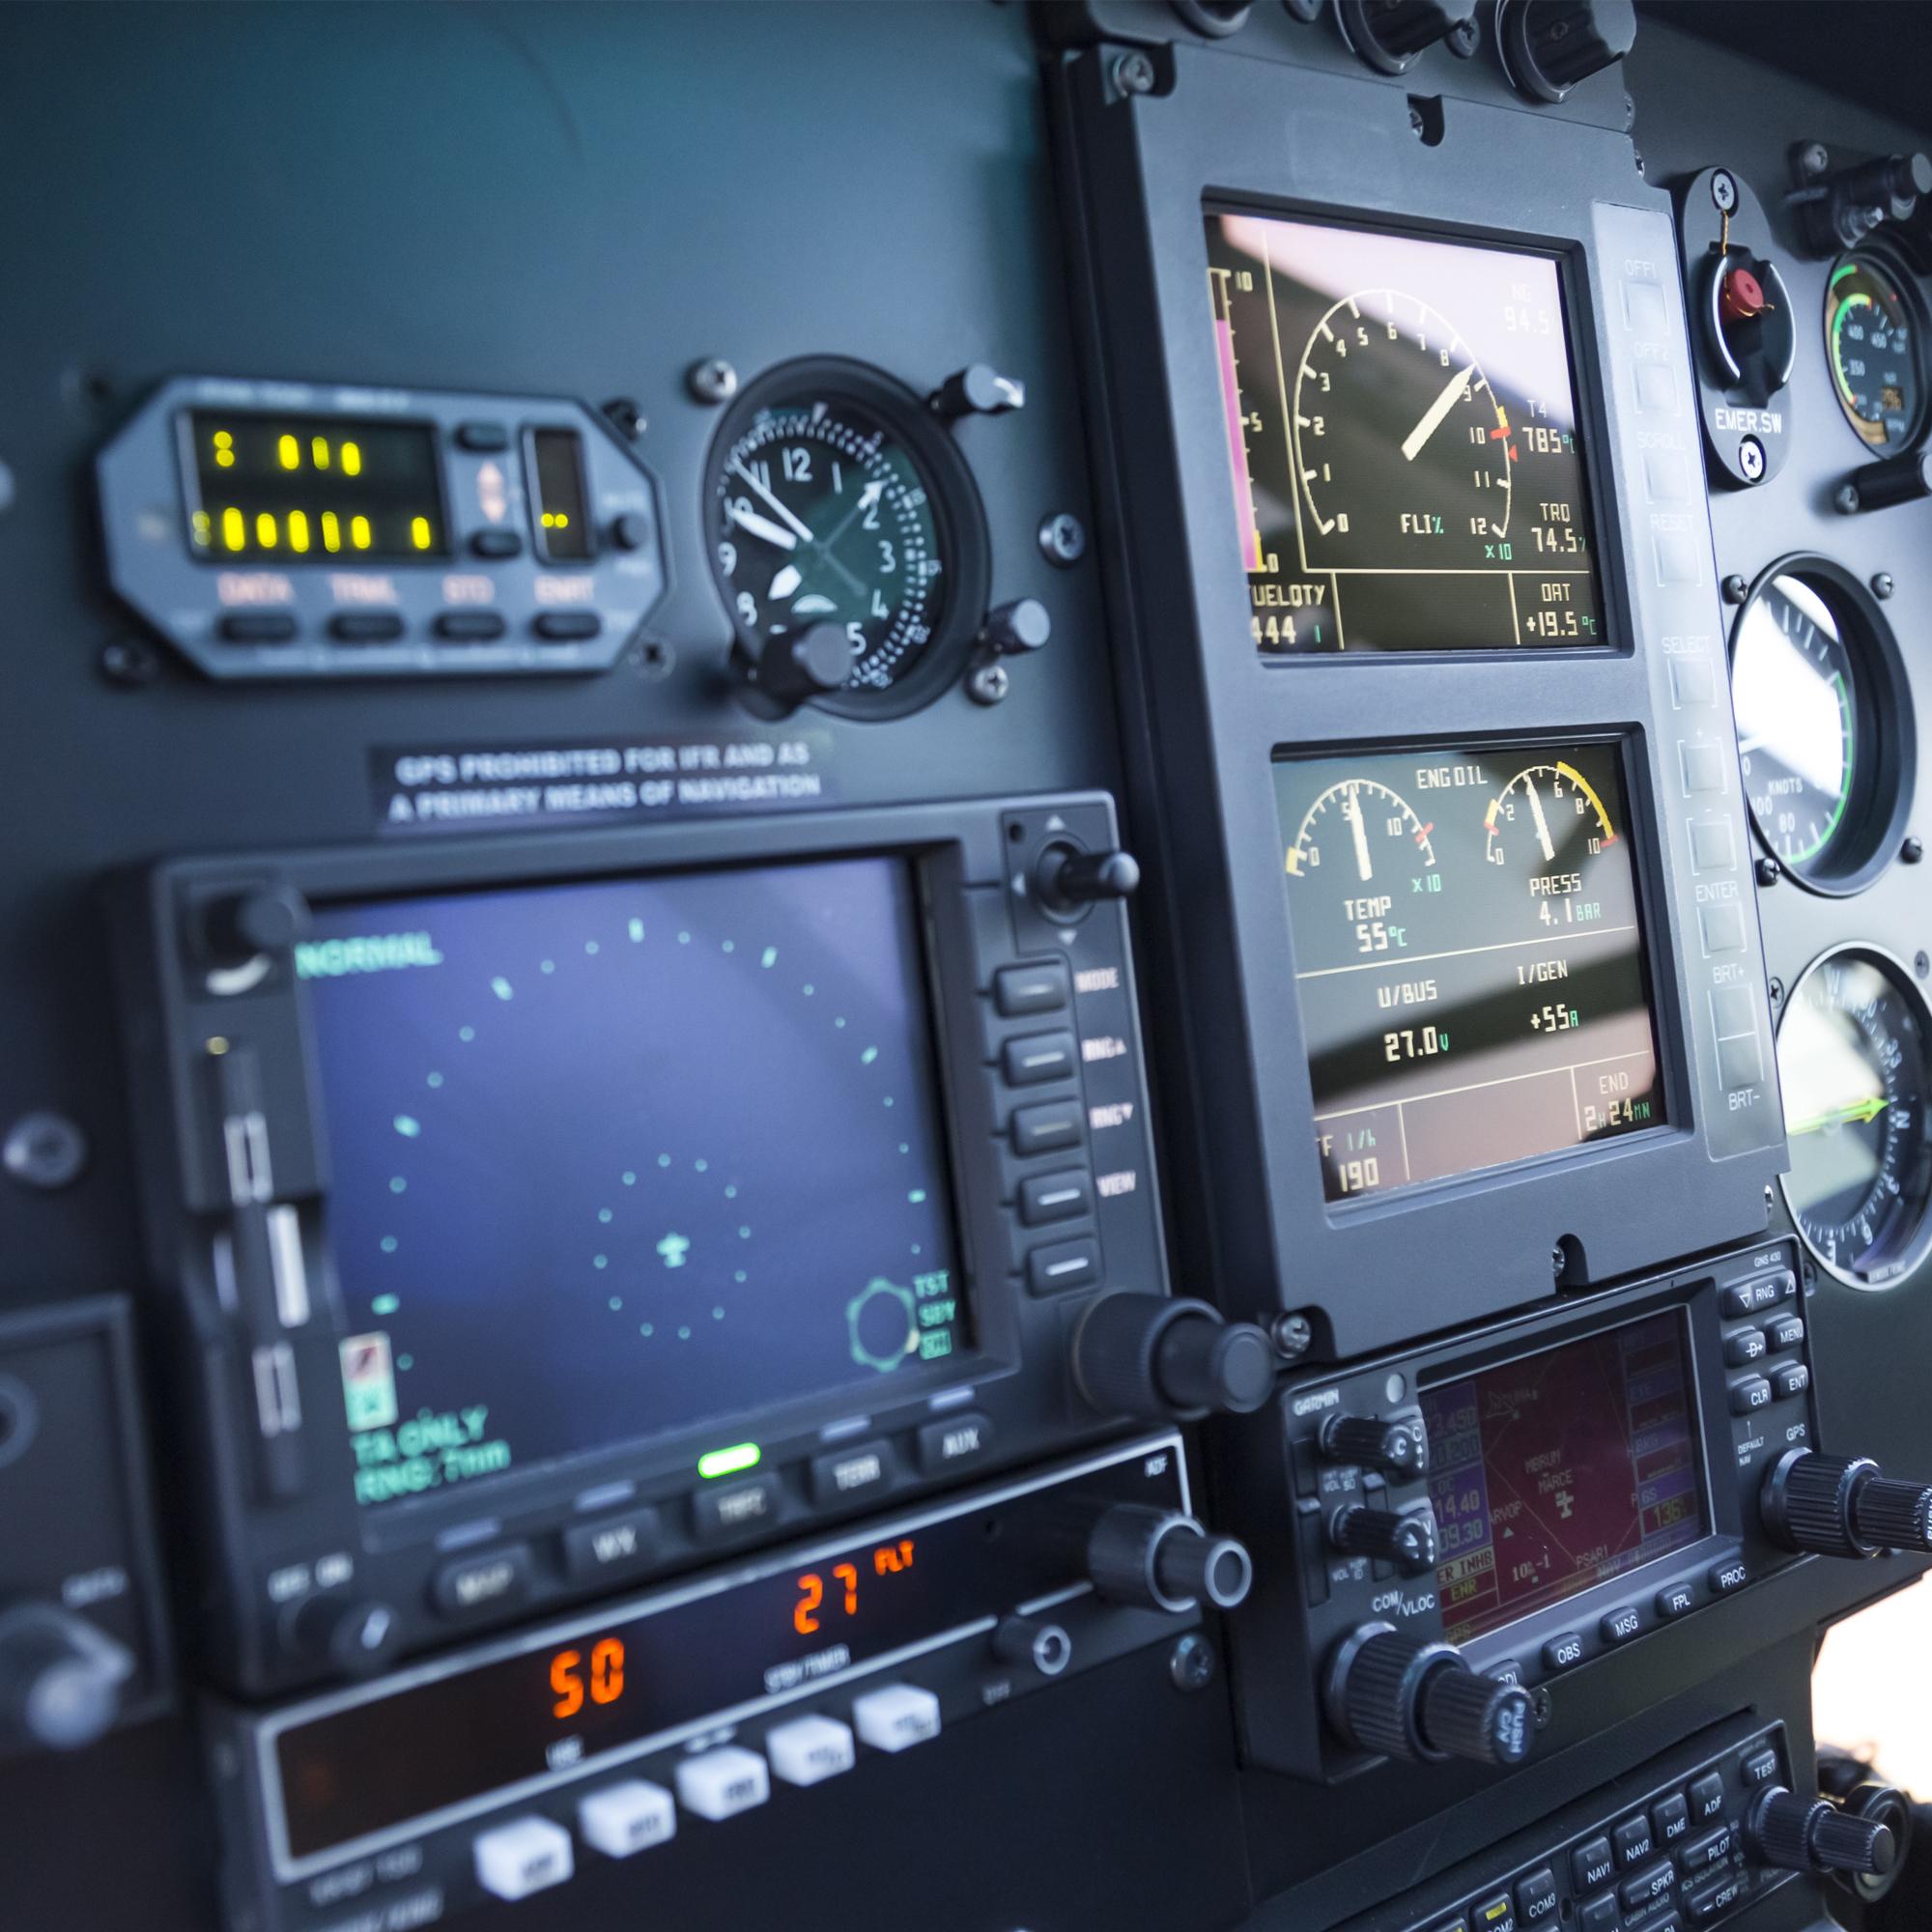 ATEQ data testing aeronautics